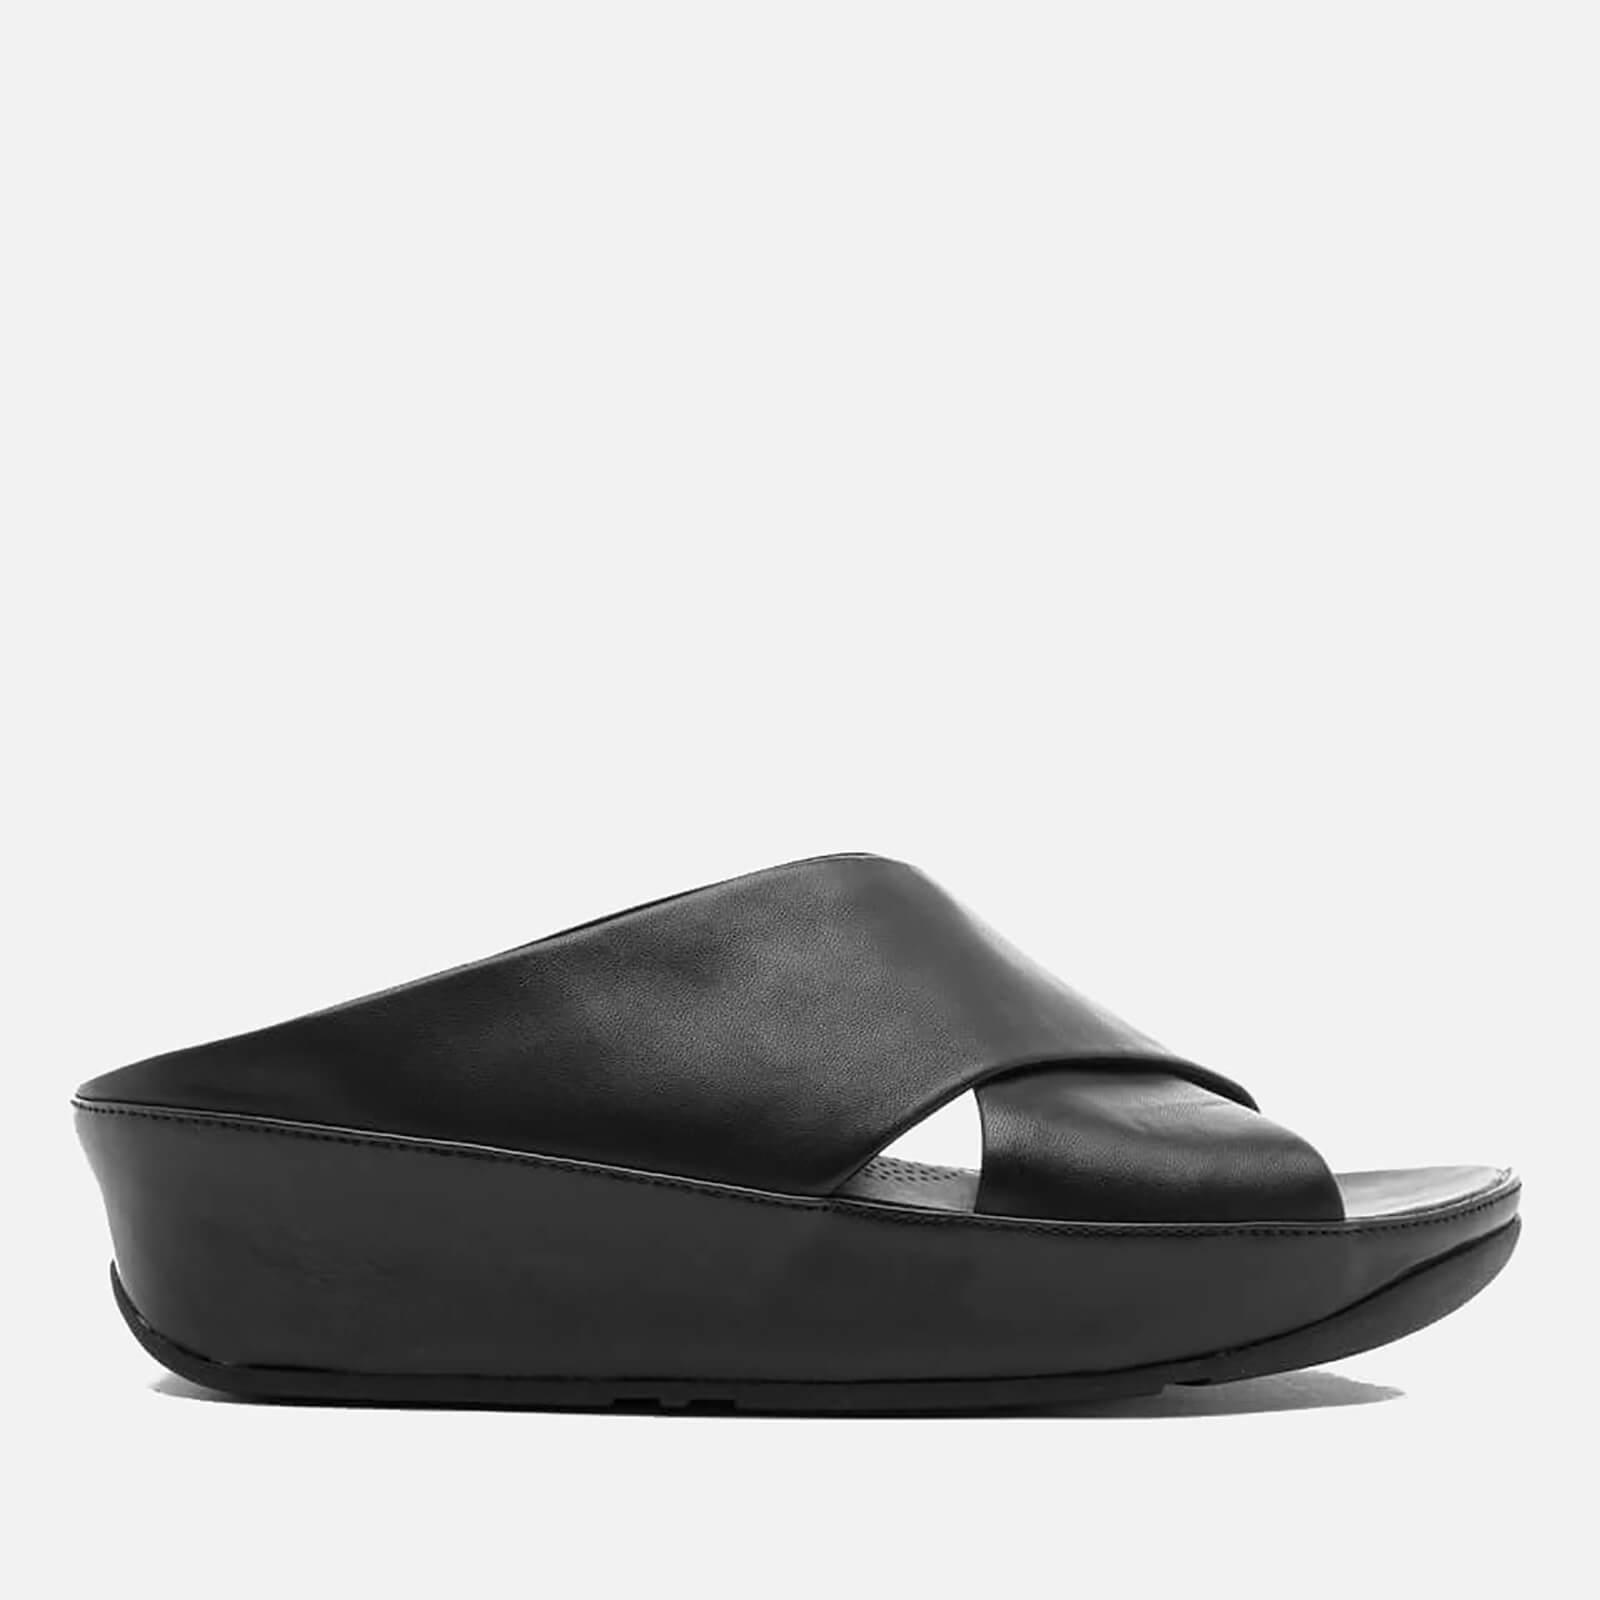 7de9cf7c6b8f FitFlop Women s Kys Leather Slide Sandals - All Black Womens Accessories